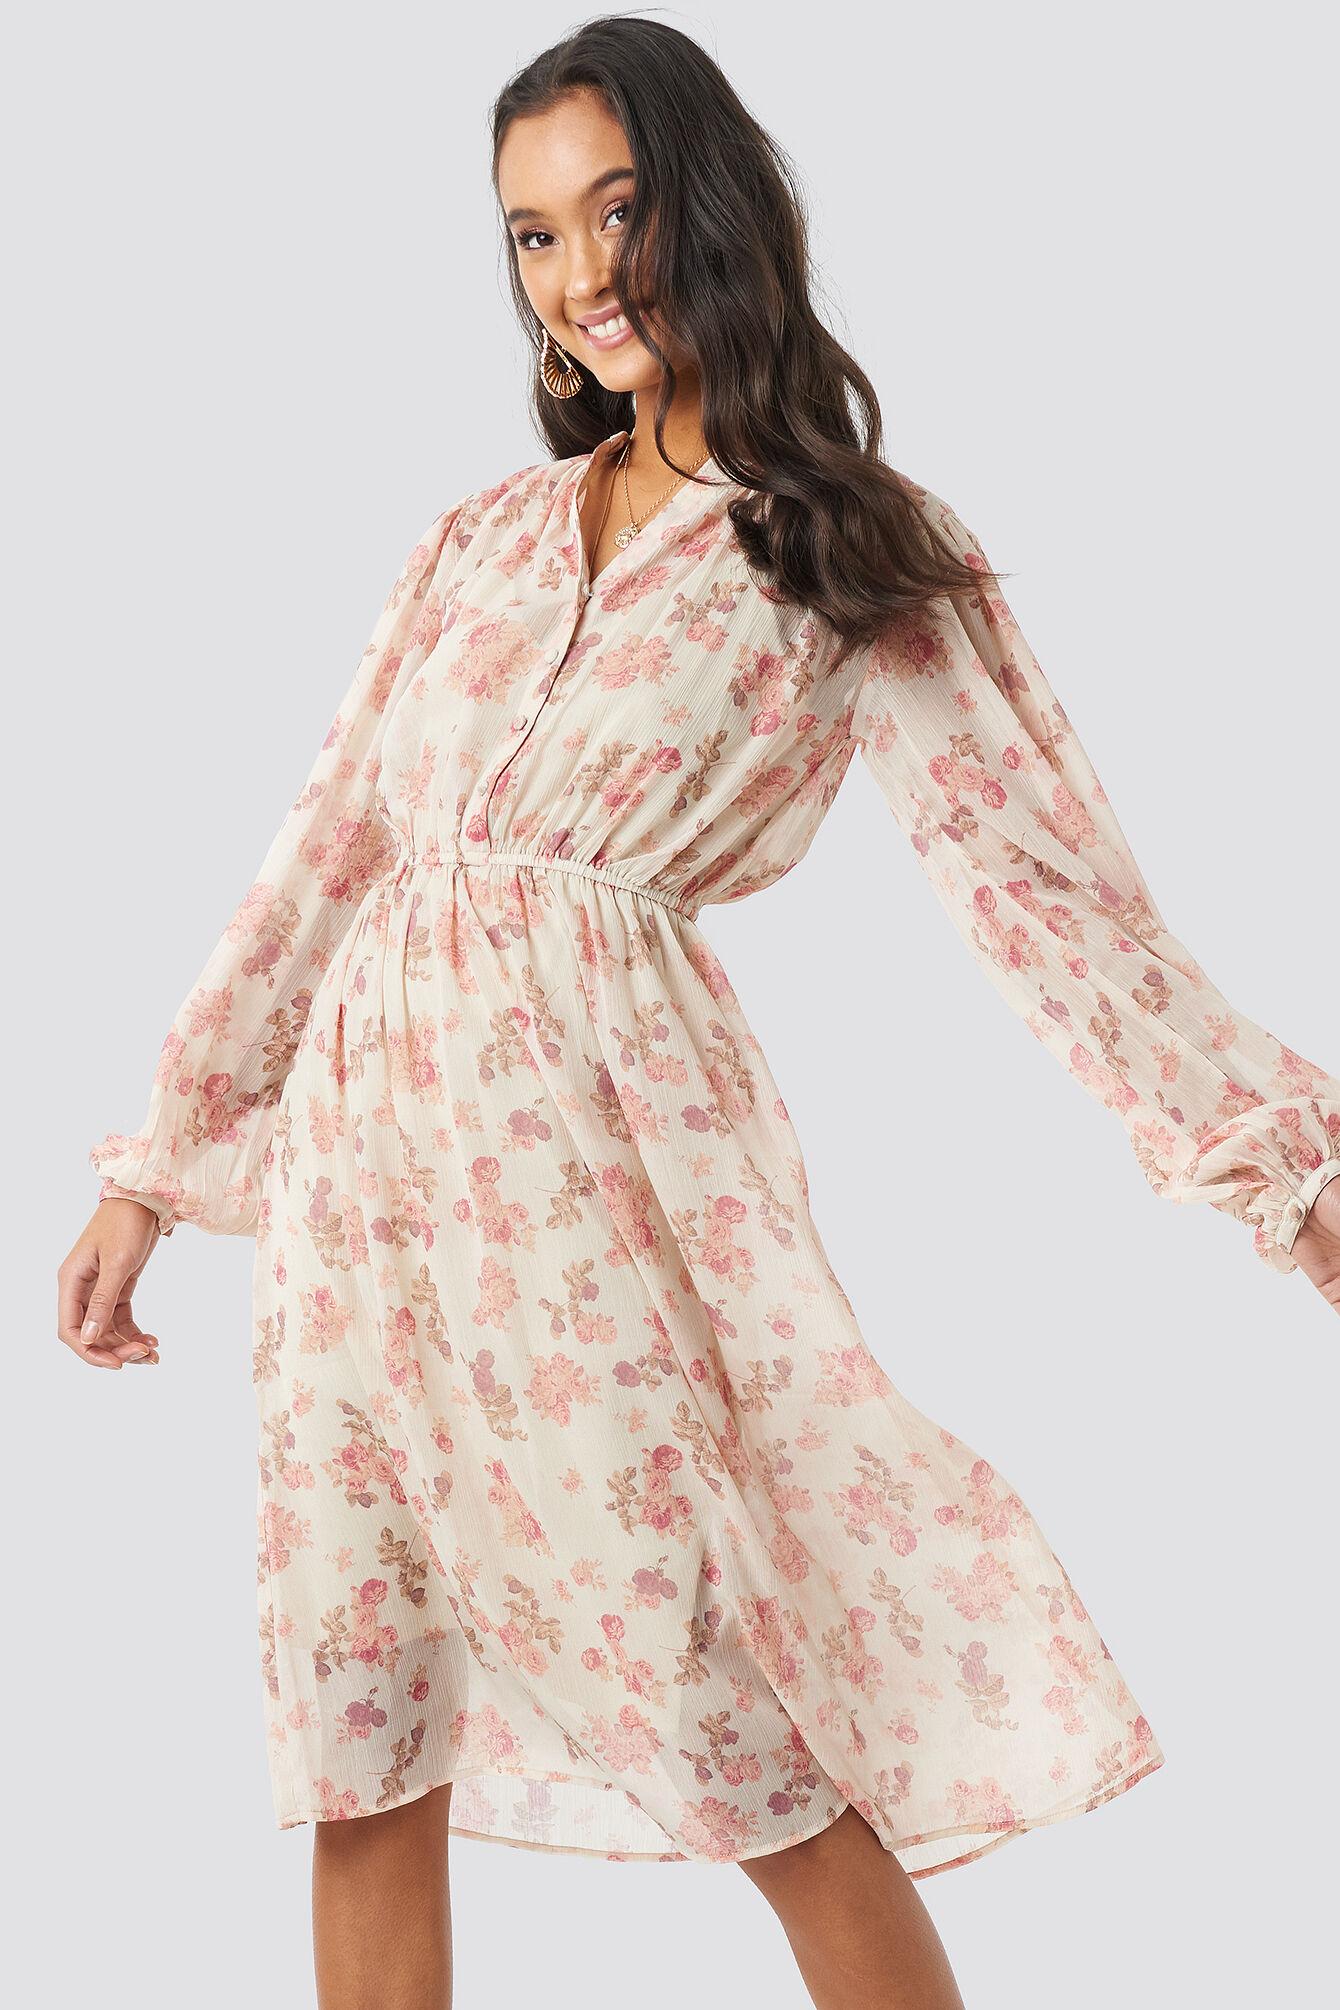 Image of NA-KD Boho Elastic Waist Chiffon Midi Dress - Pink,Beige,Nude